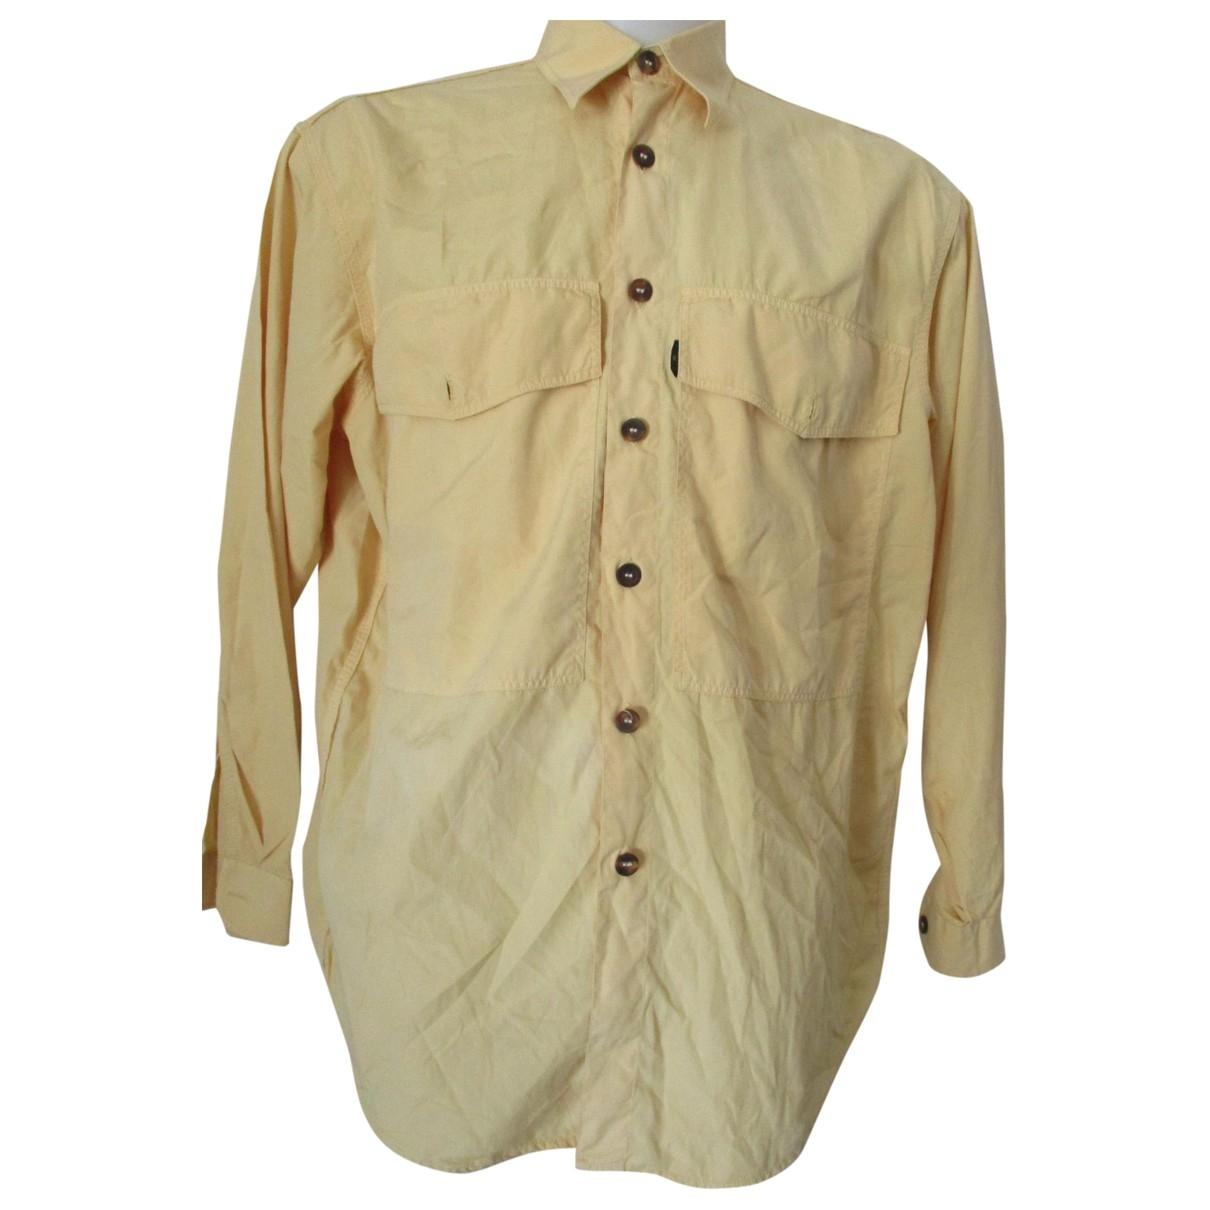 Valentino Garavani \N Yellow Cotton Shirts for Men 40 EU (tour de cou / collar)